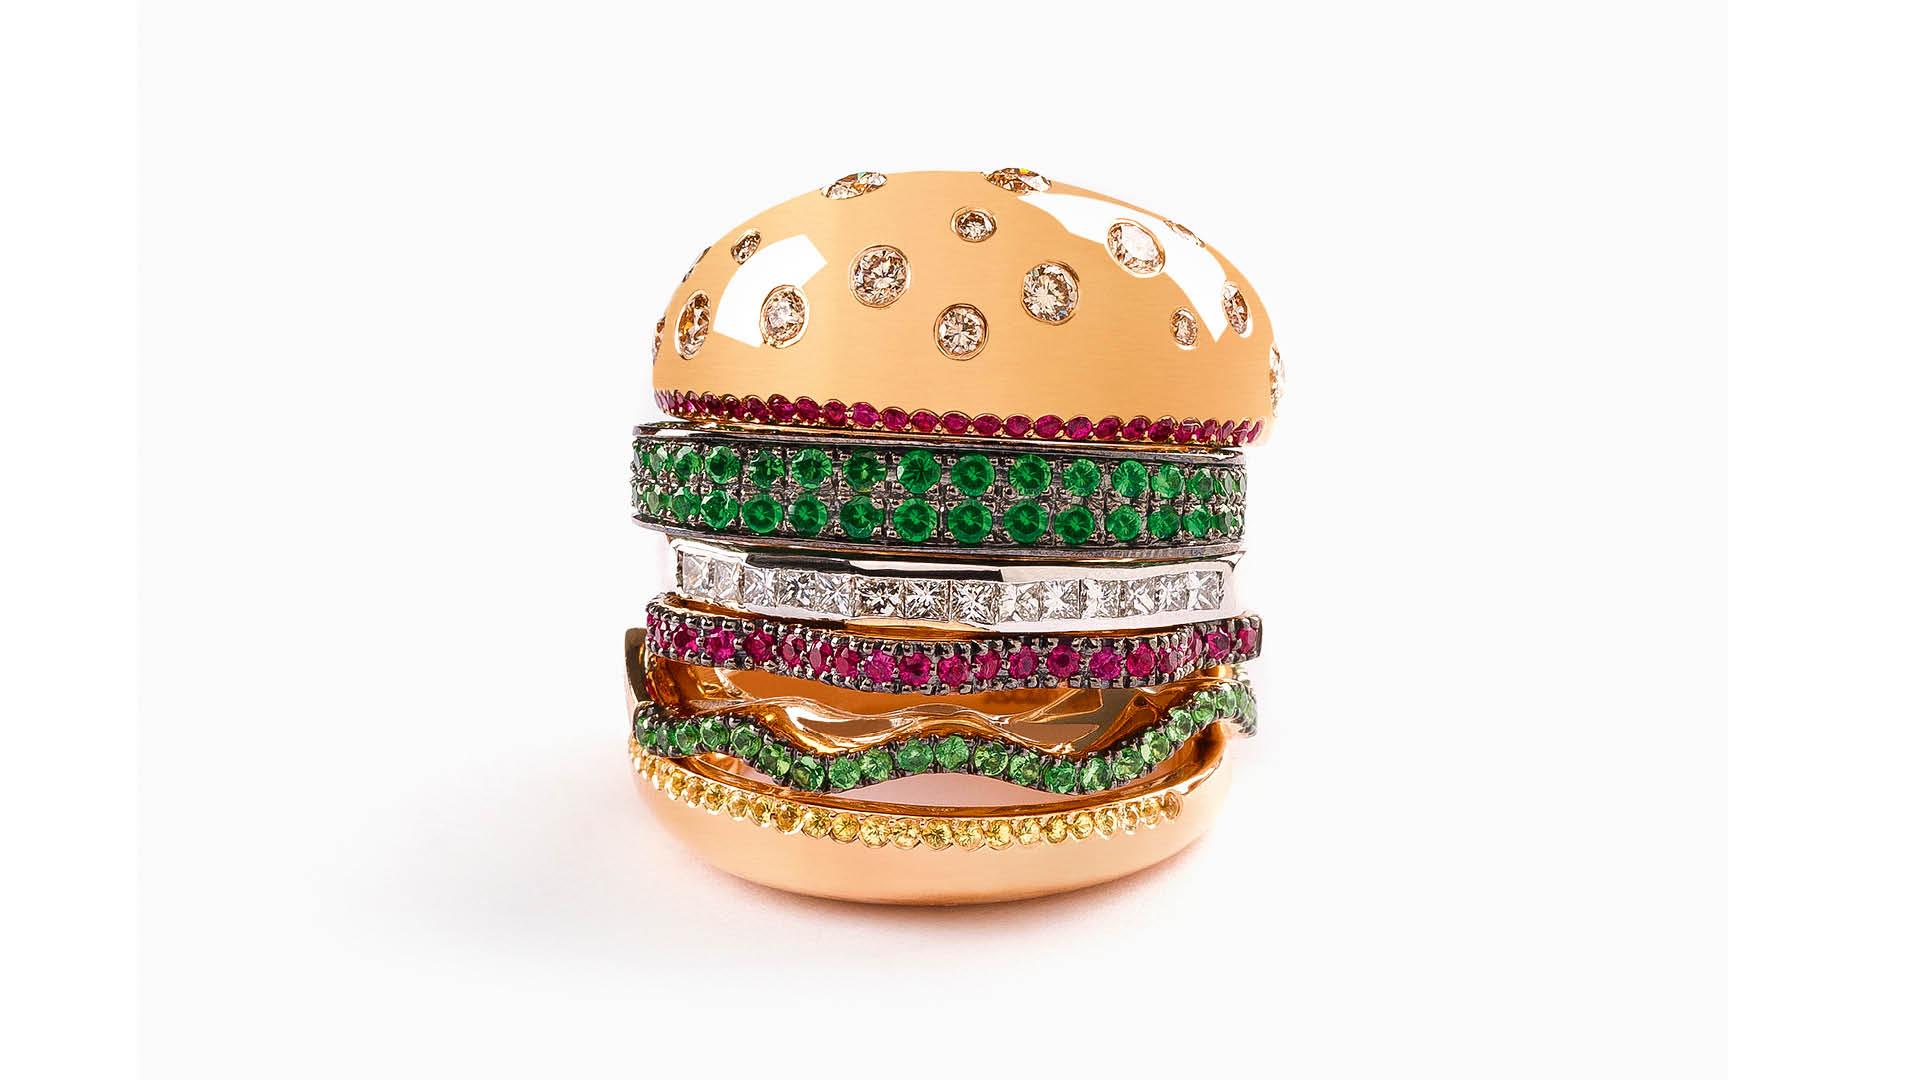 Nadine-Ghosn-Burger-Ring